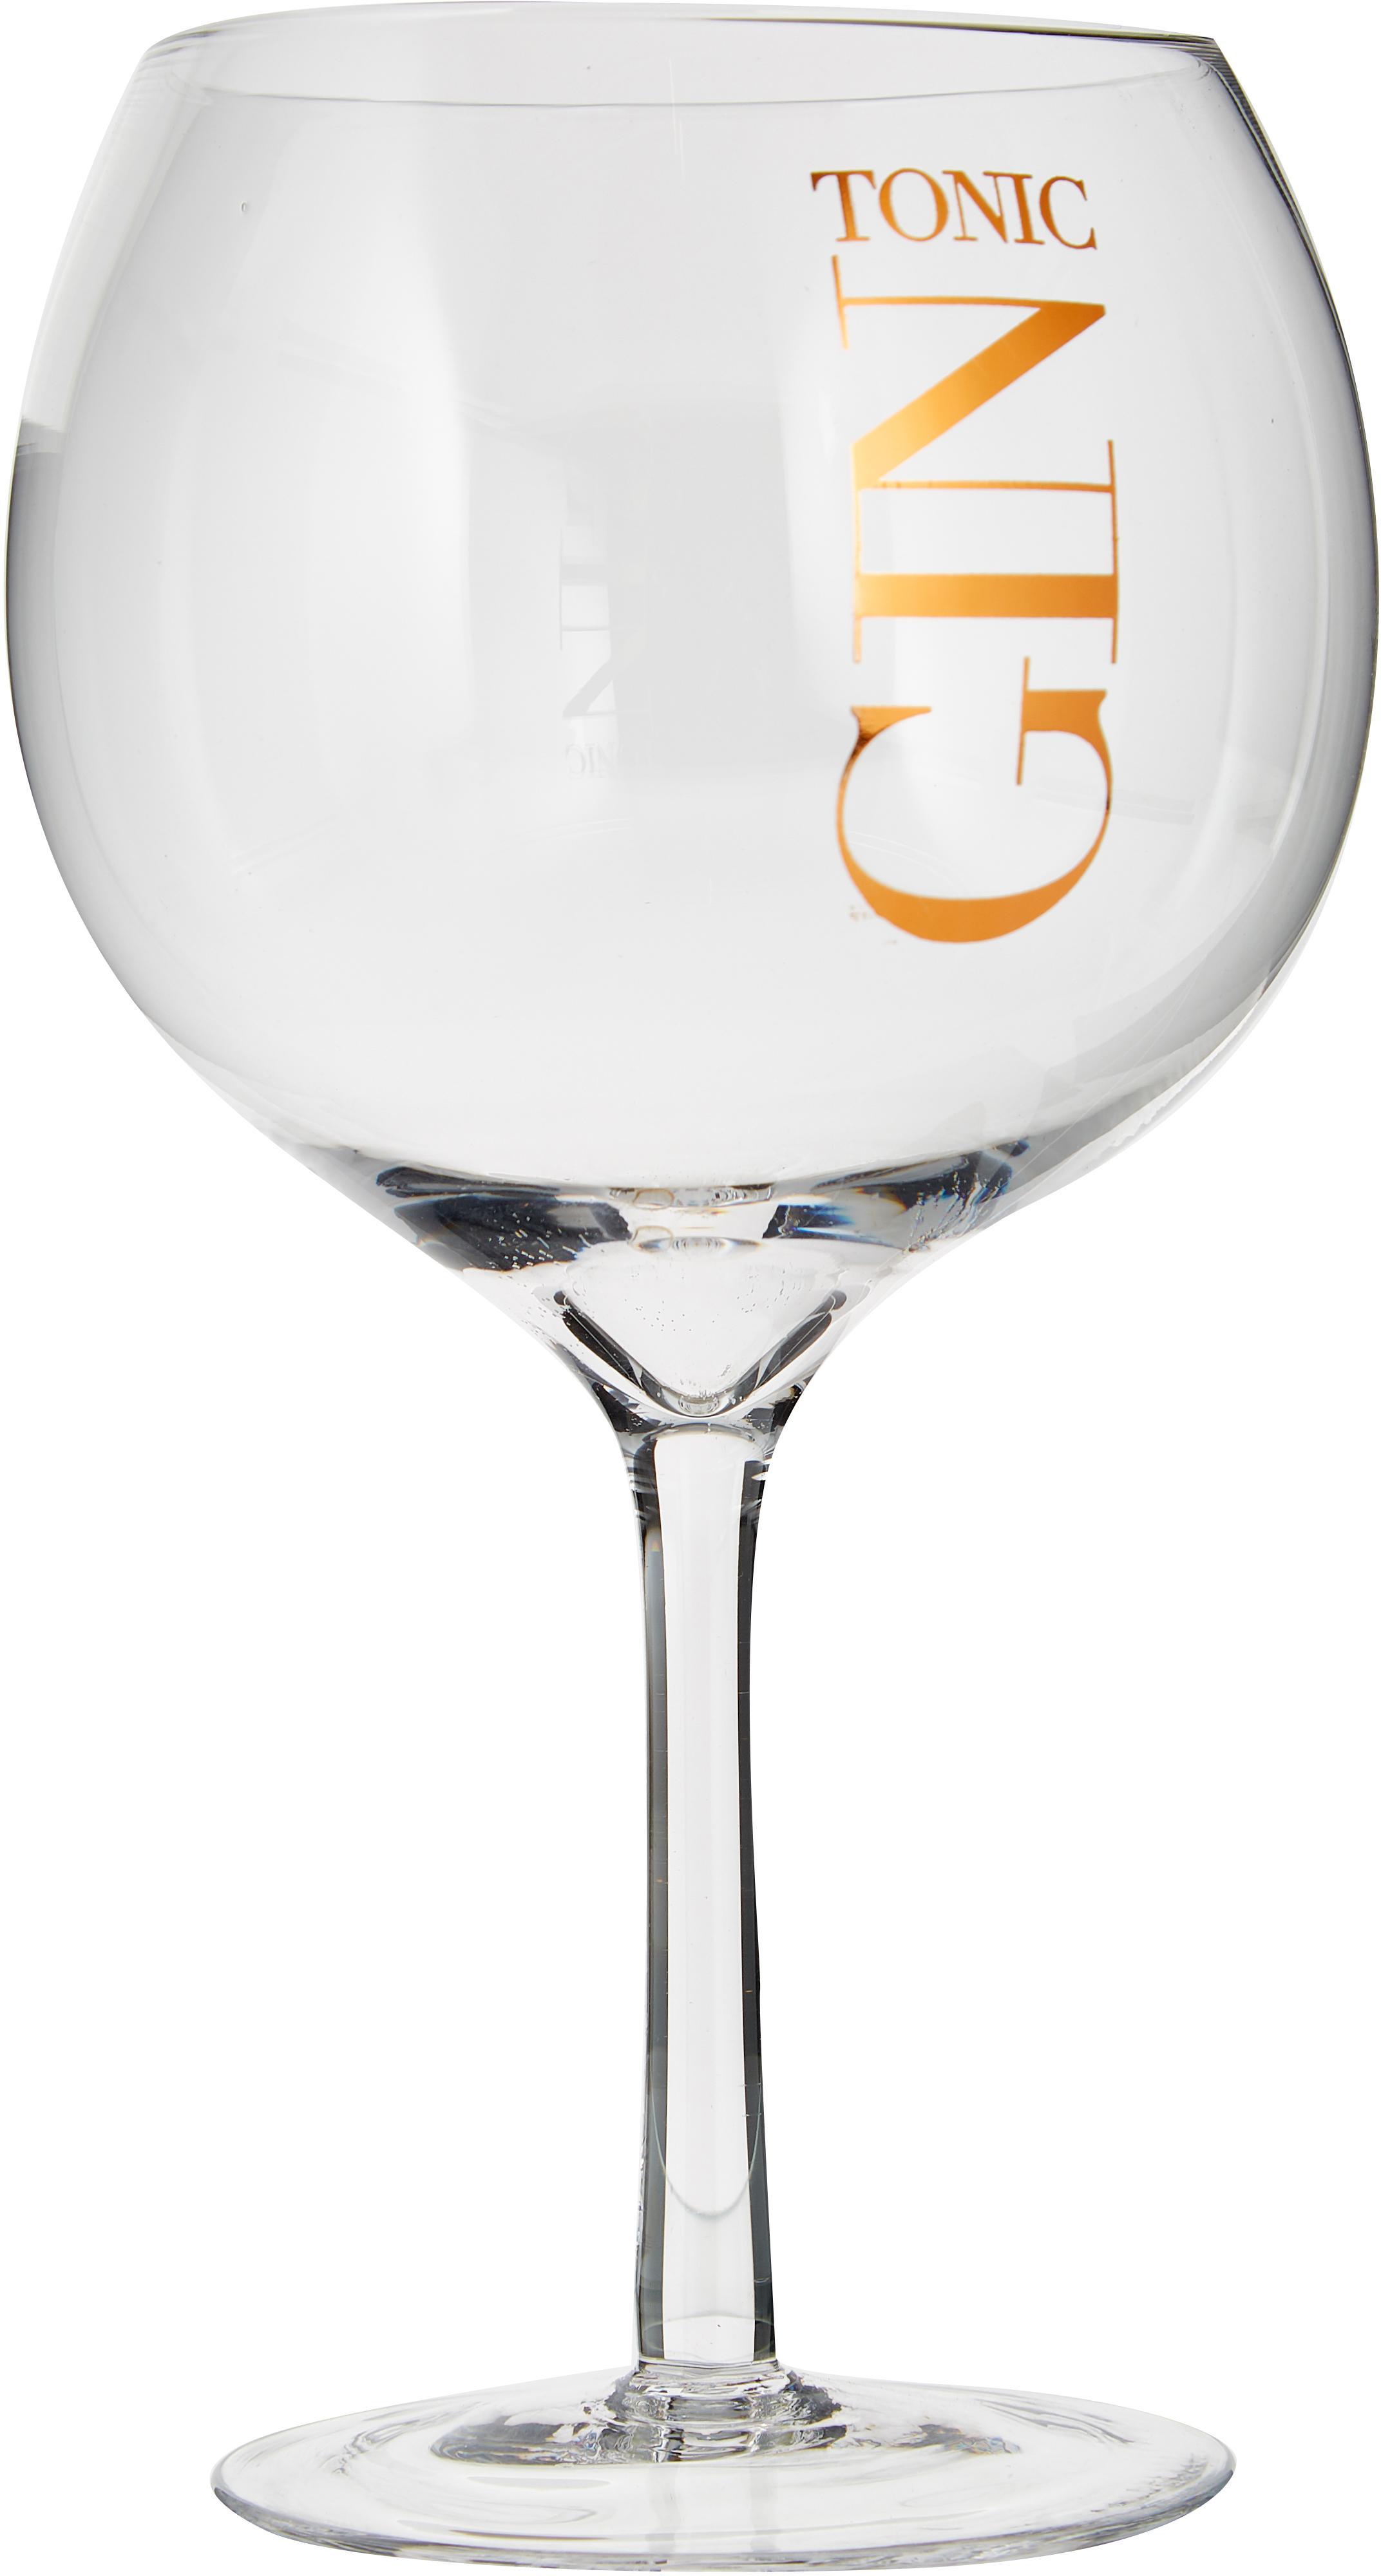 Bicchiere da cocktail Gin Tonic 6 pz, Vetro, Trasparente, dorato, Ø 12 x Alt. 22 cm